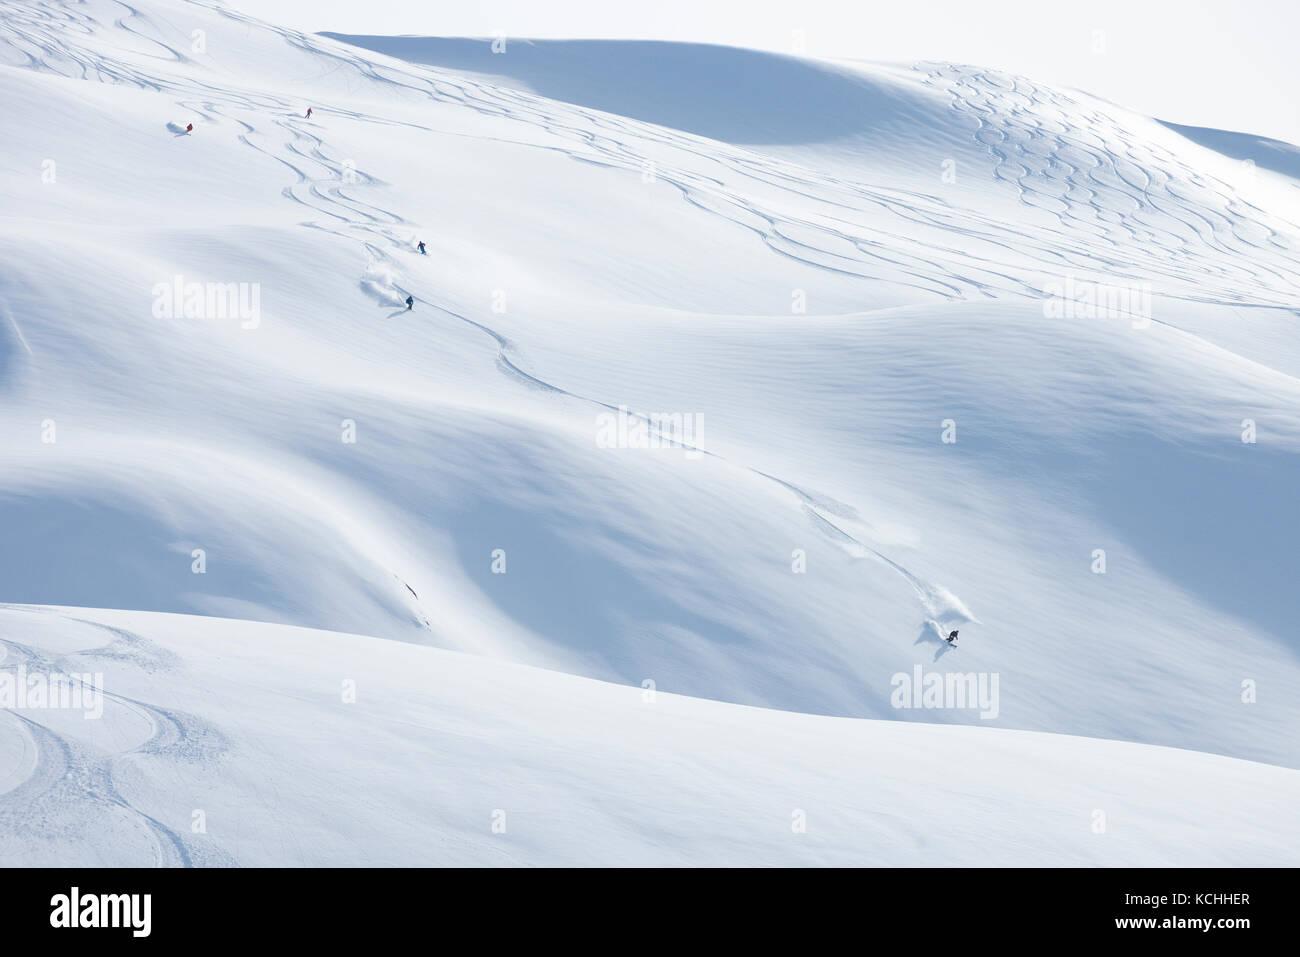 Incredible heliskiing runs off Repeater Mountain, Bella Coola Helisports - Stock Image